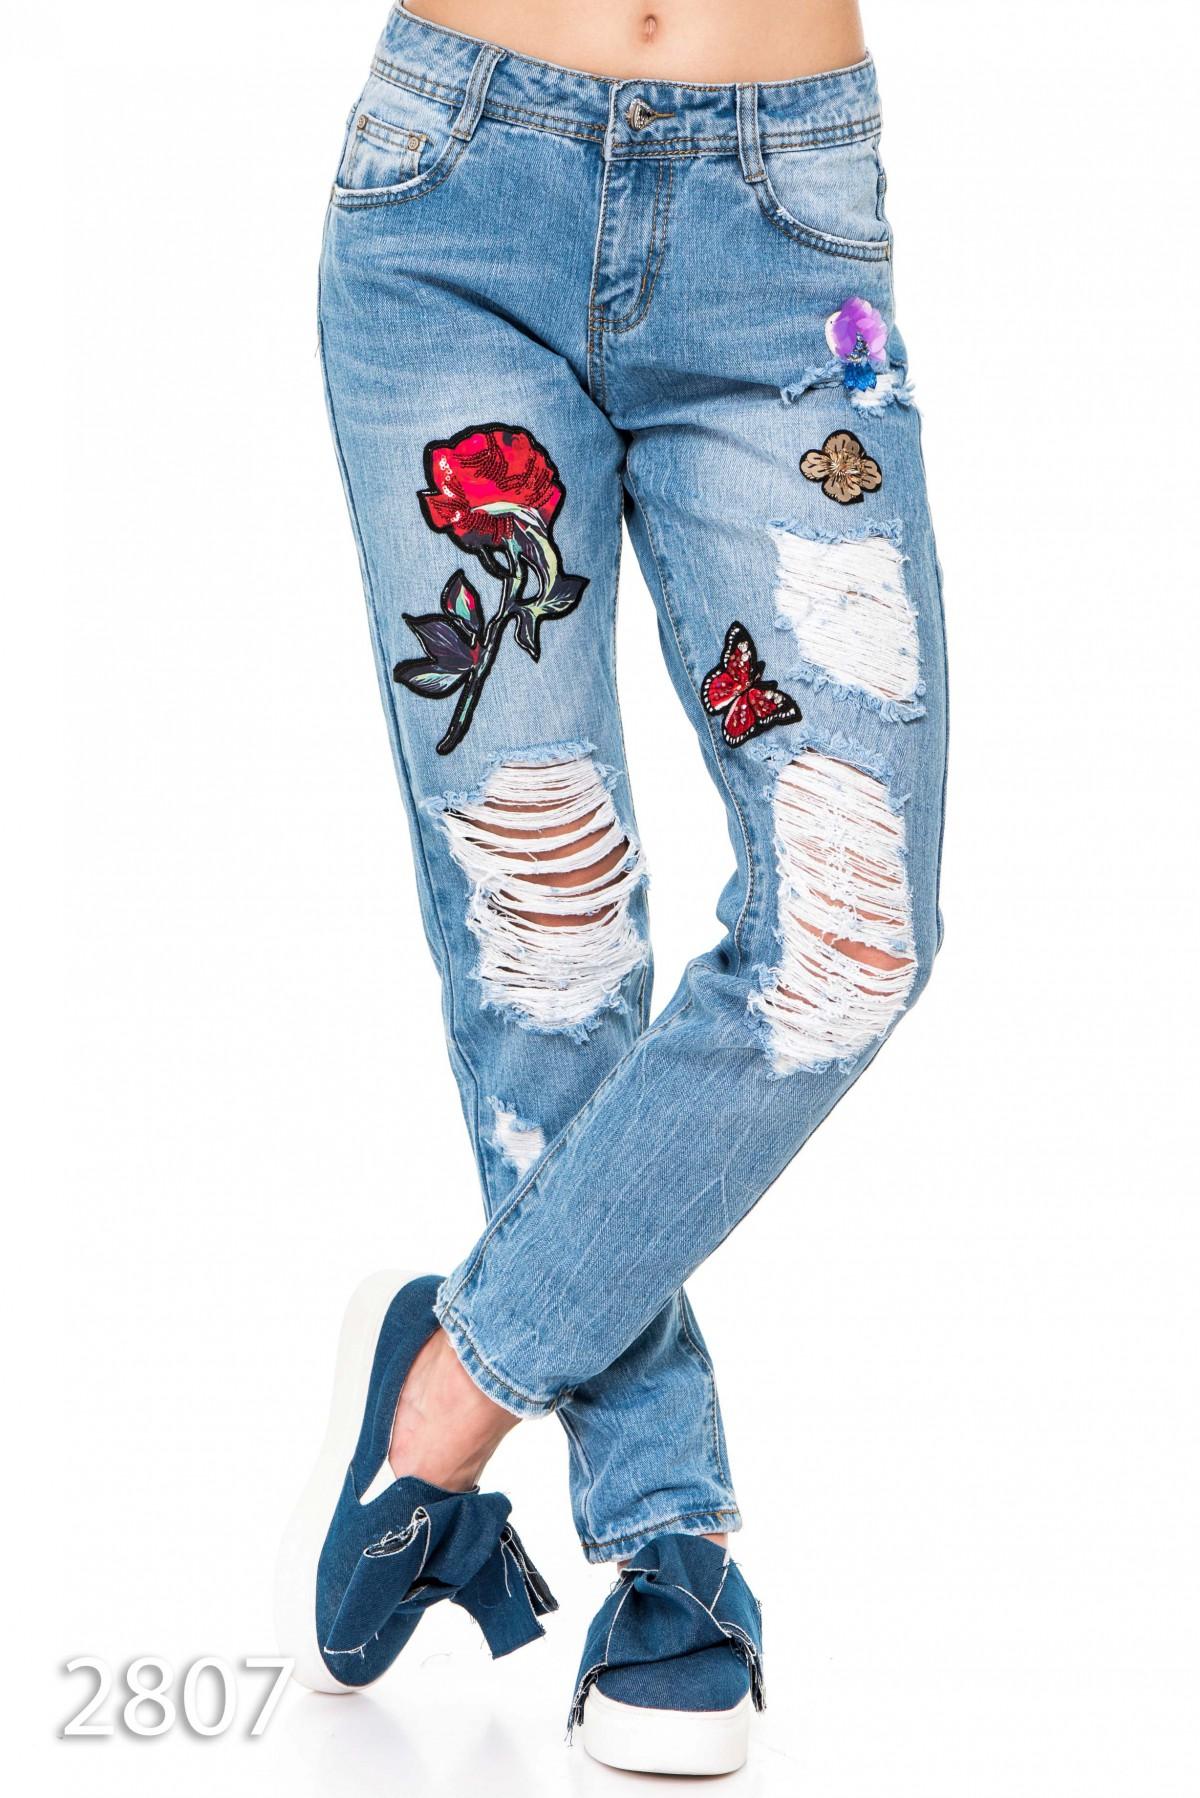 Вышивка на джинсах пайетками